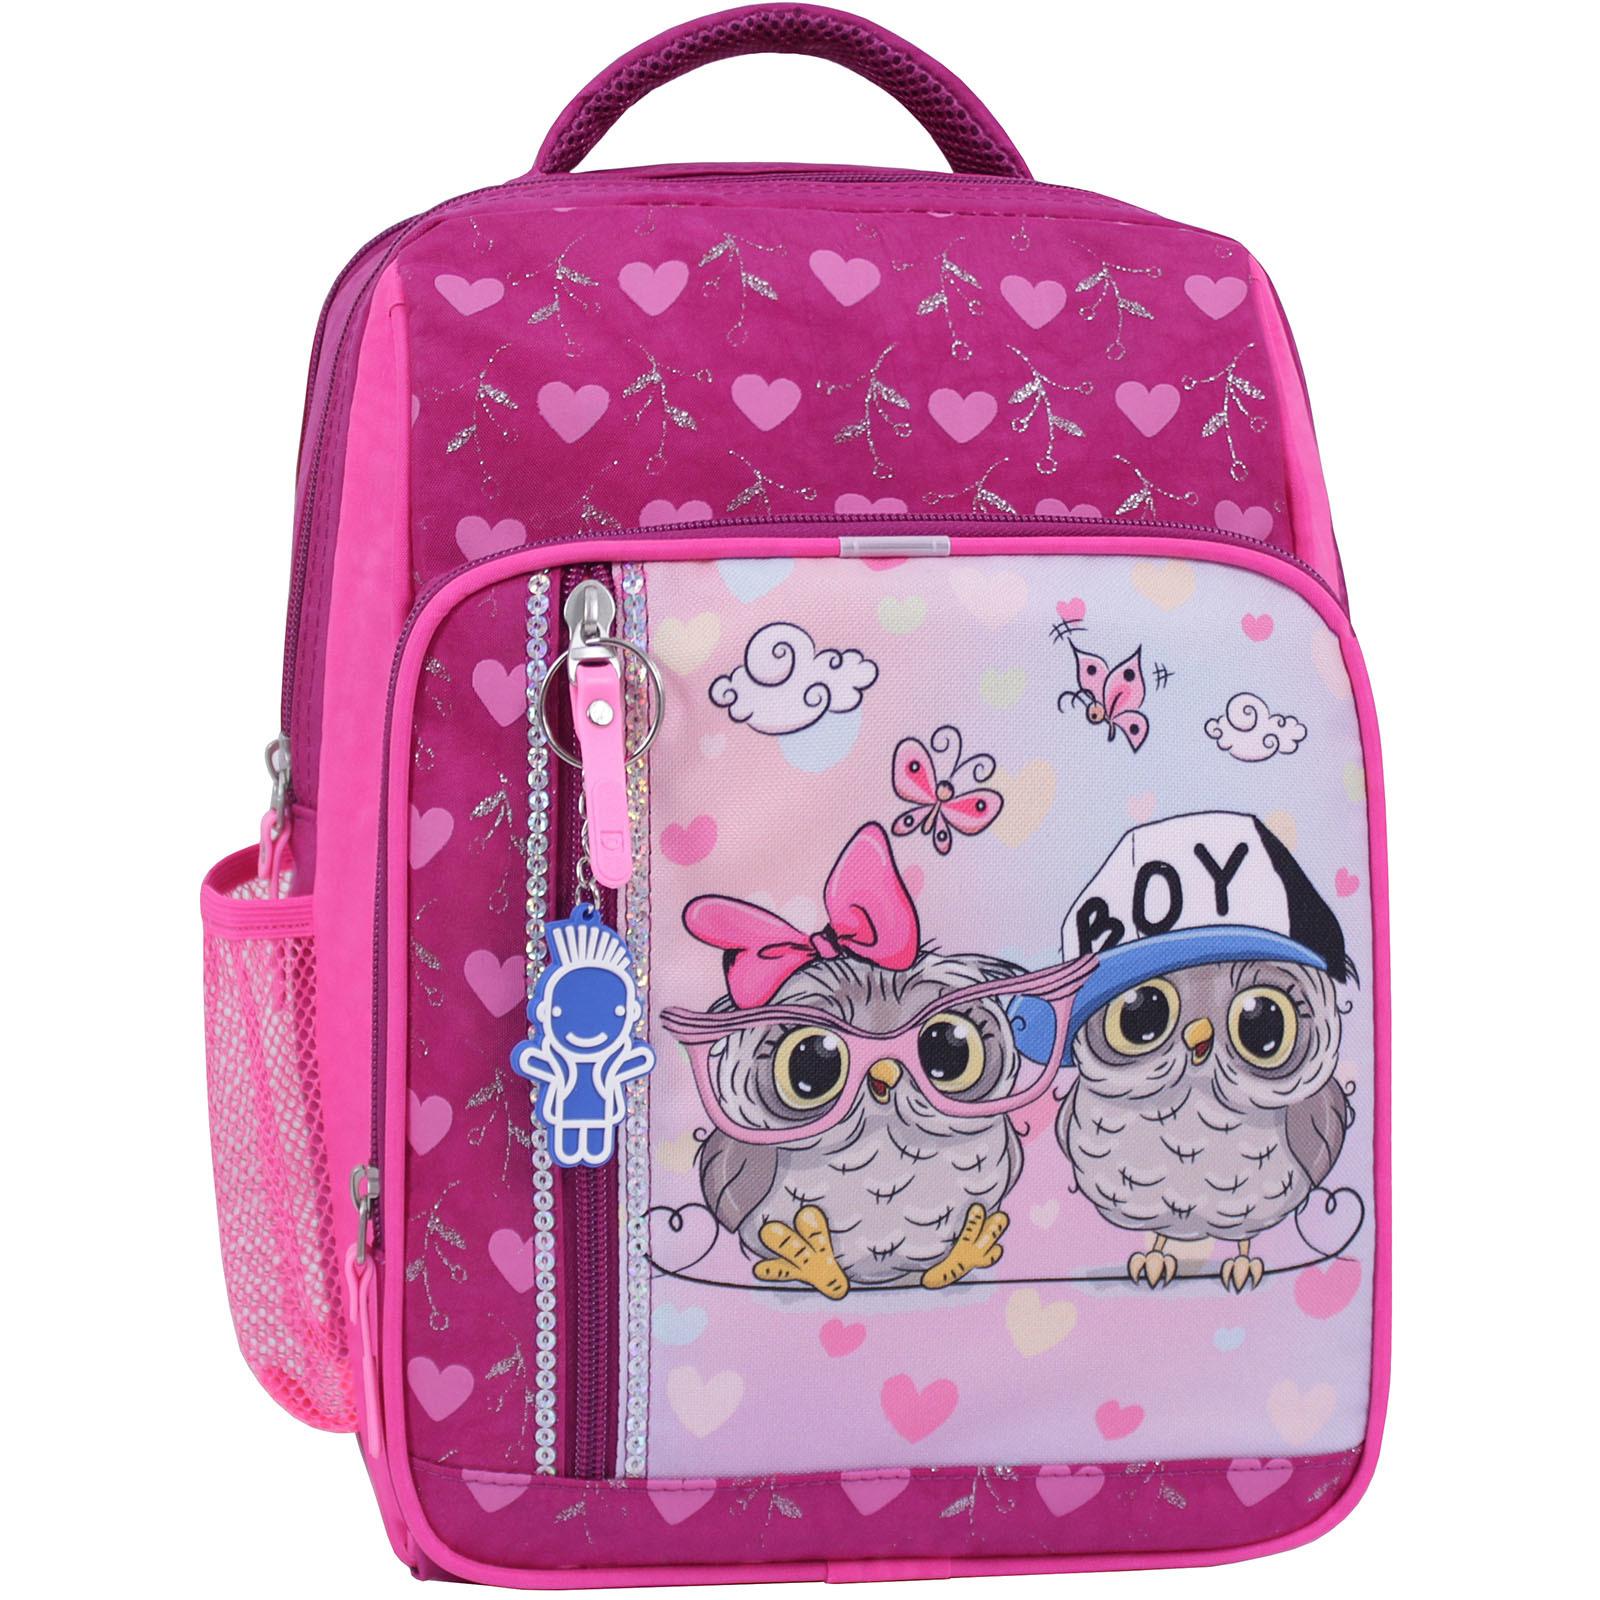 Школьные рюкзаки Рюкзак школьный Bagland Школьник 8 л. 143 малина 515 (00112702) IMG_1611_суб.515_.JPG